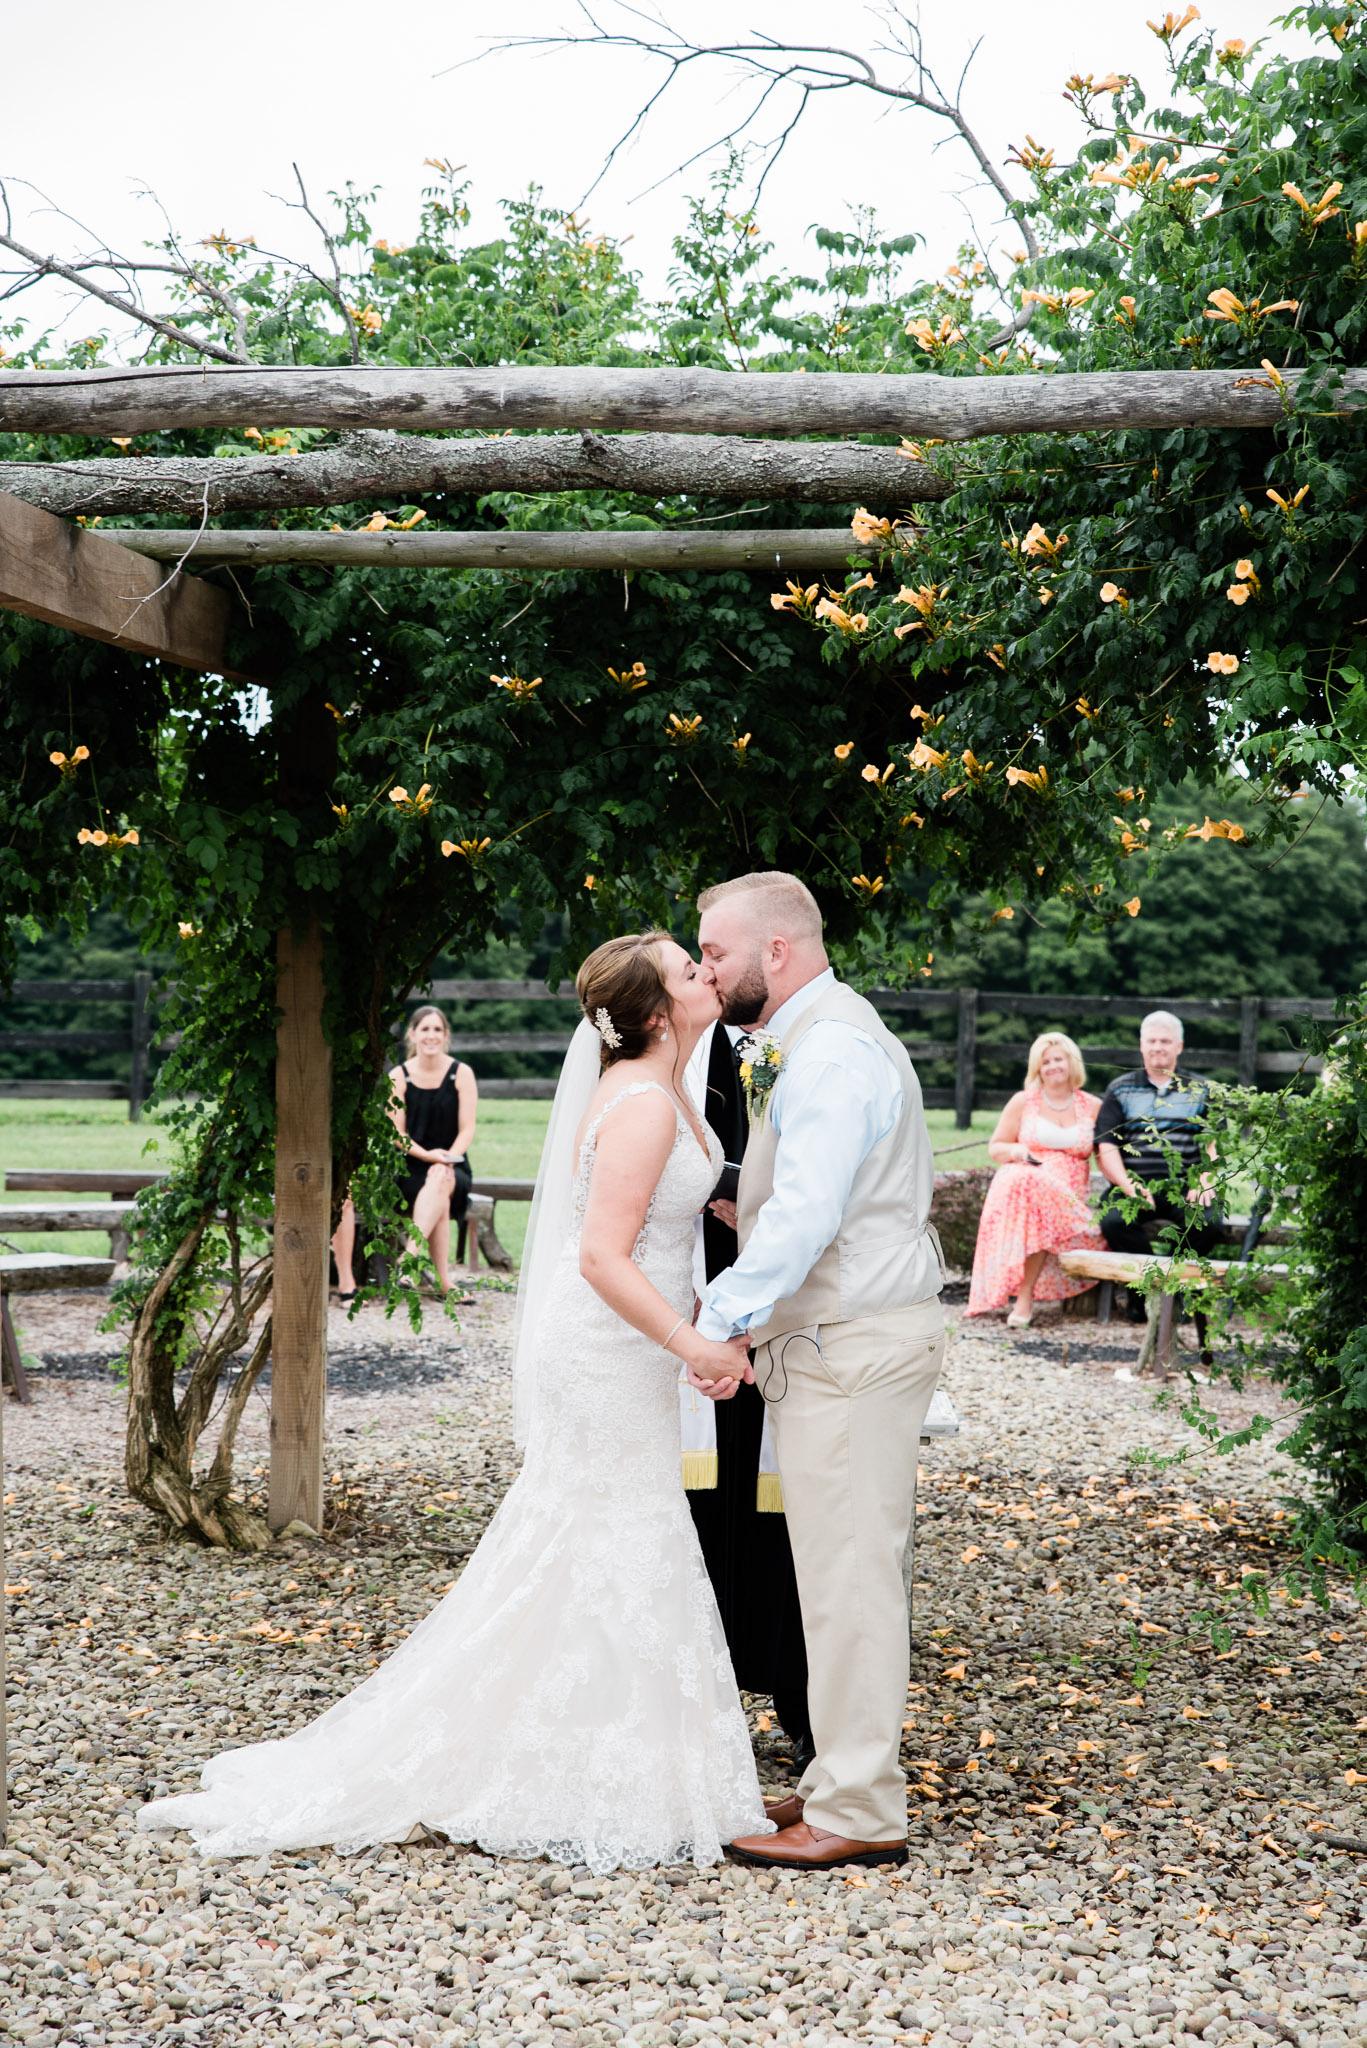 Mariah Fisher Photography, the Hayloft of PA, wedding photographer-9781.jpg